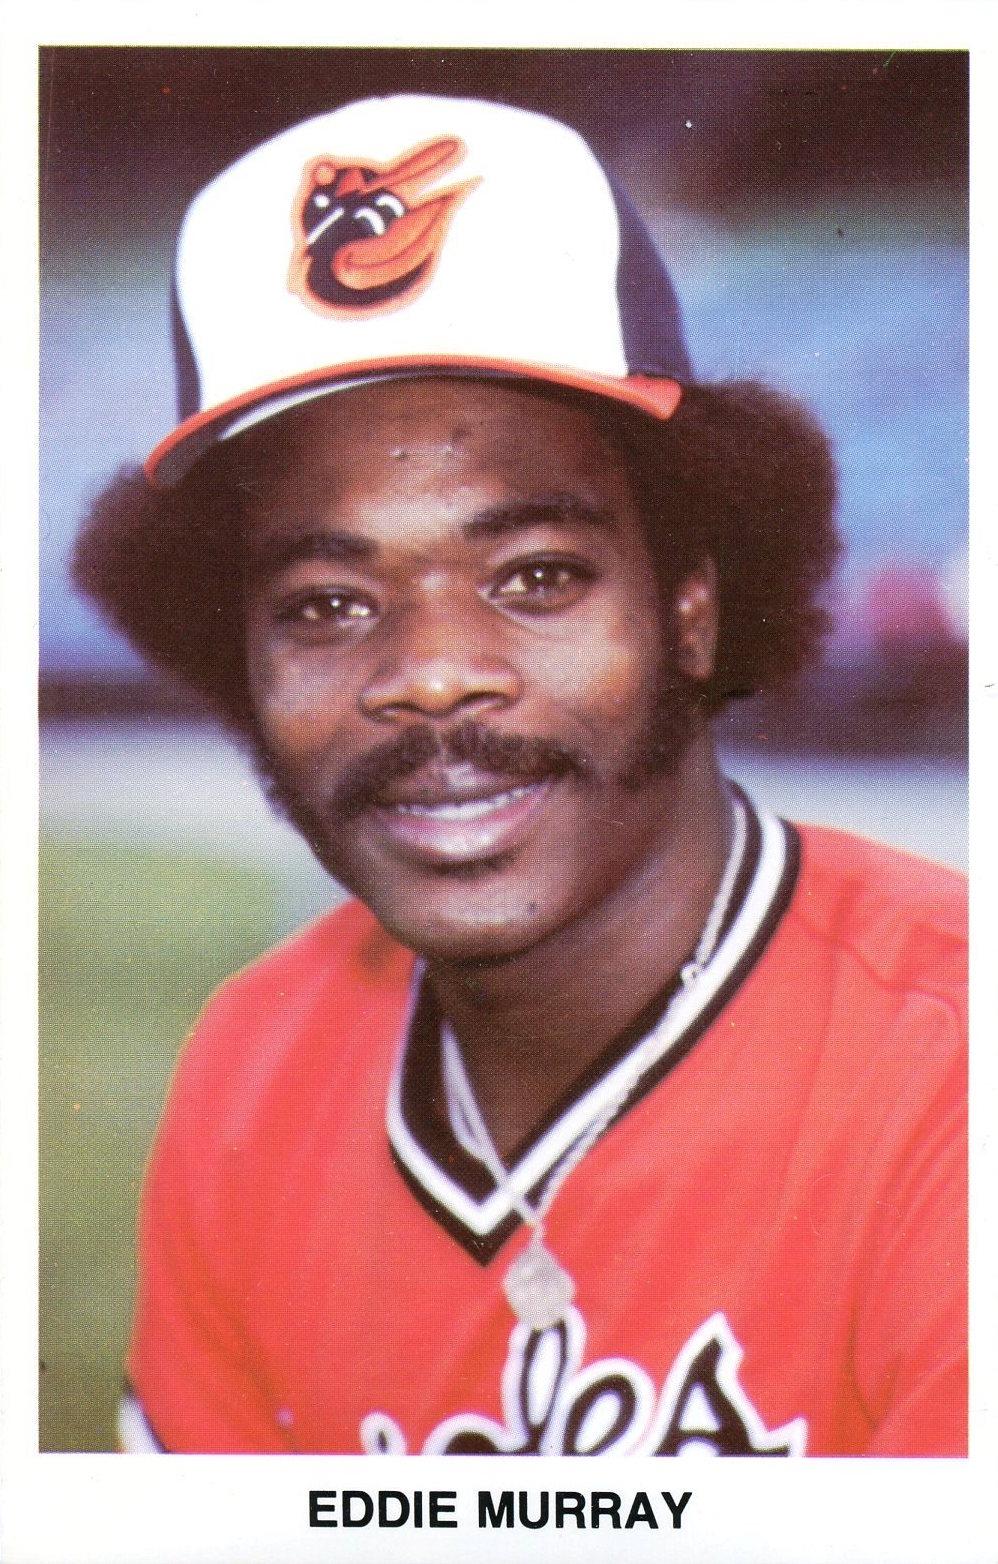 1977 Baltimore Orioles Eddie Murray Postcard